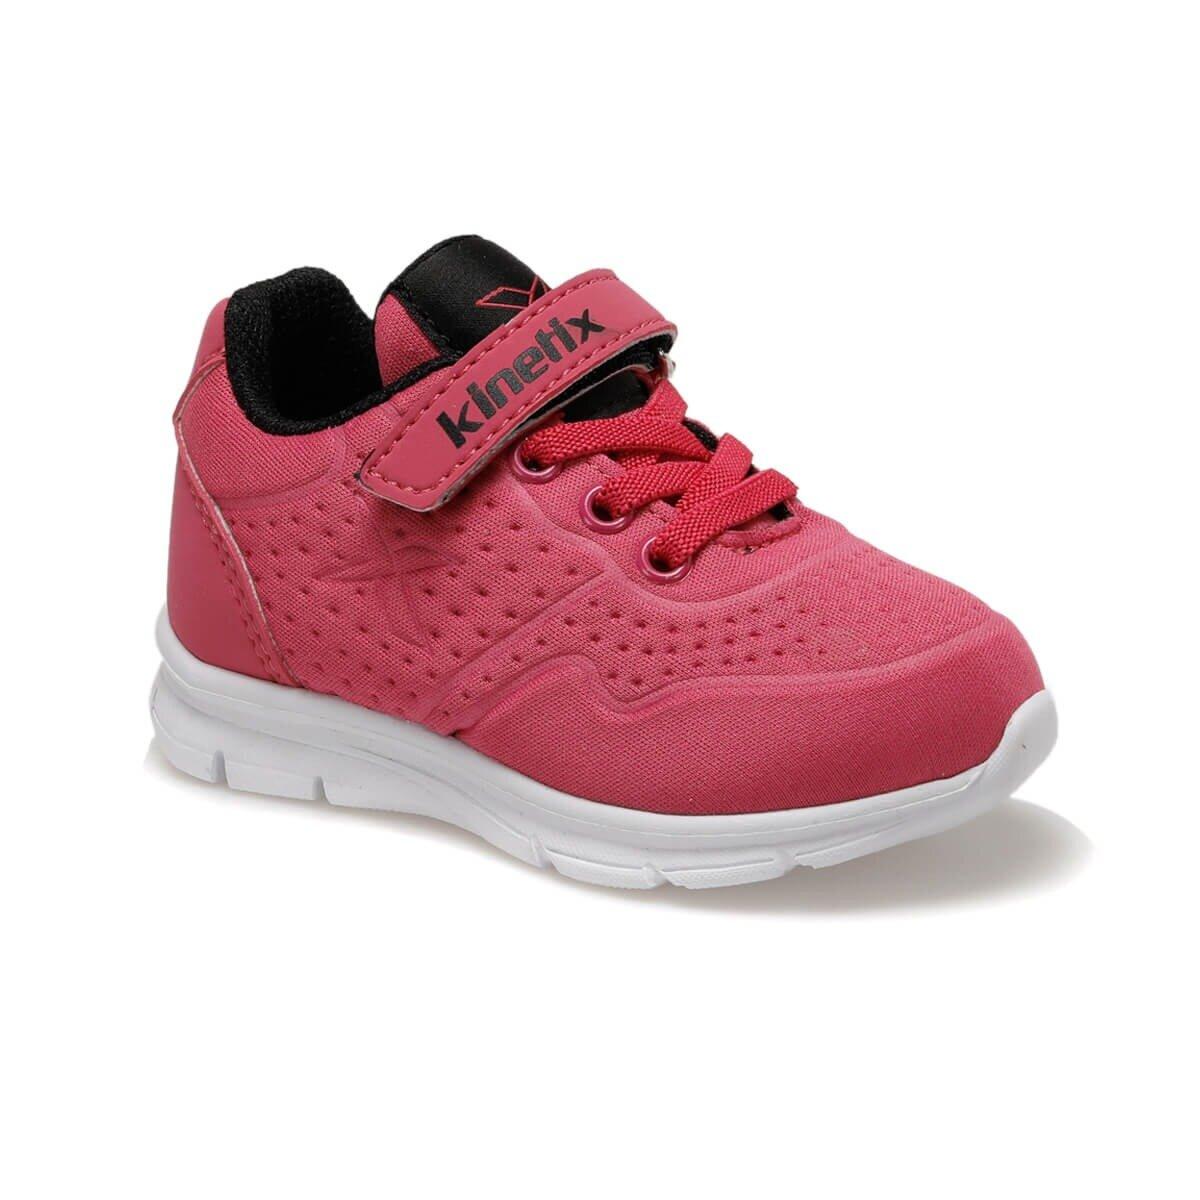 FLO MY NOSE 9PR Fuchsia Female Child Sneaker SHOES KINETIX